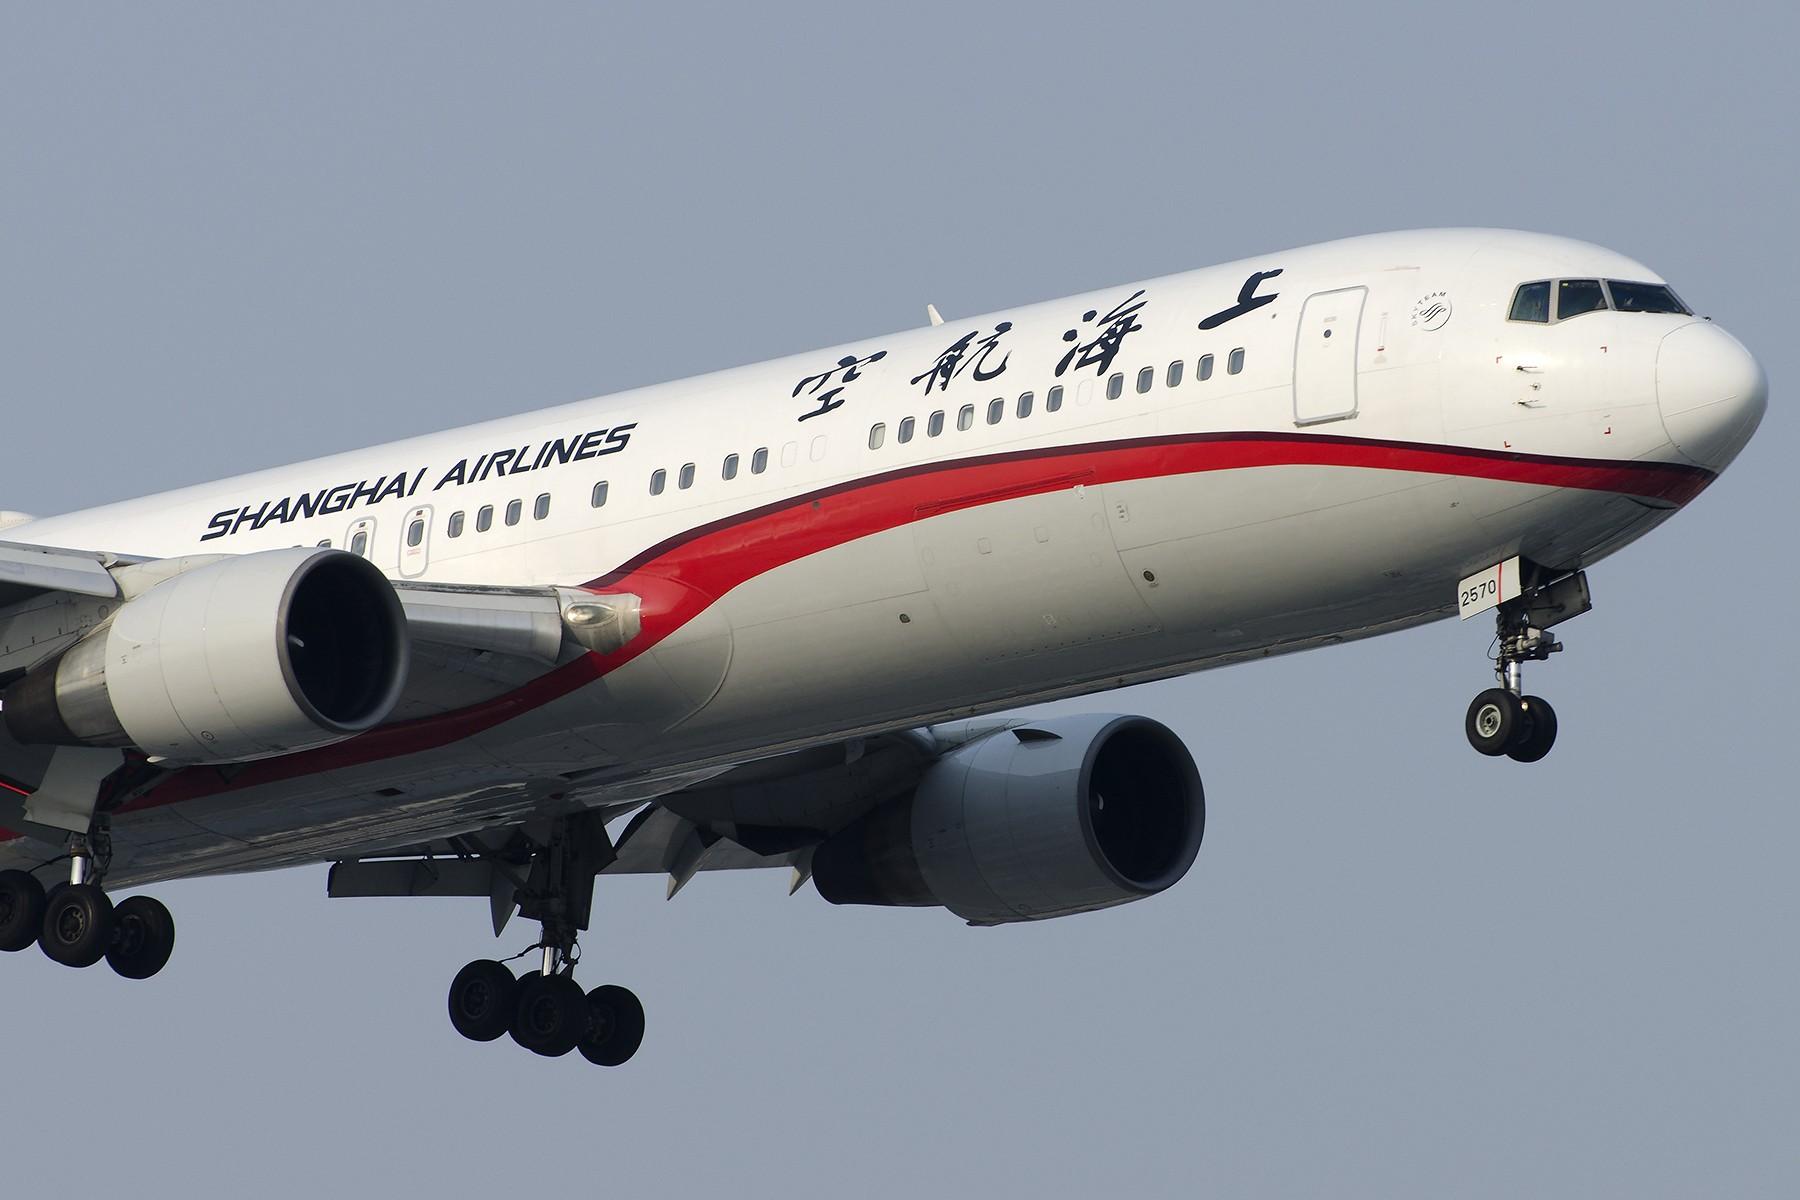 Re:[原创][原创]【SHA拍机*1800大图】4月拍的了,记得那天好货还挺多 BOEING 767-300 B-2570 中国上海虹桥国际机场